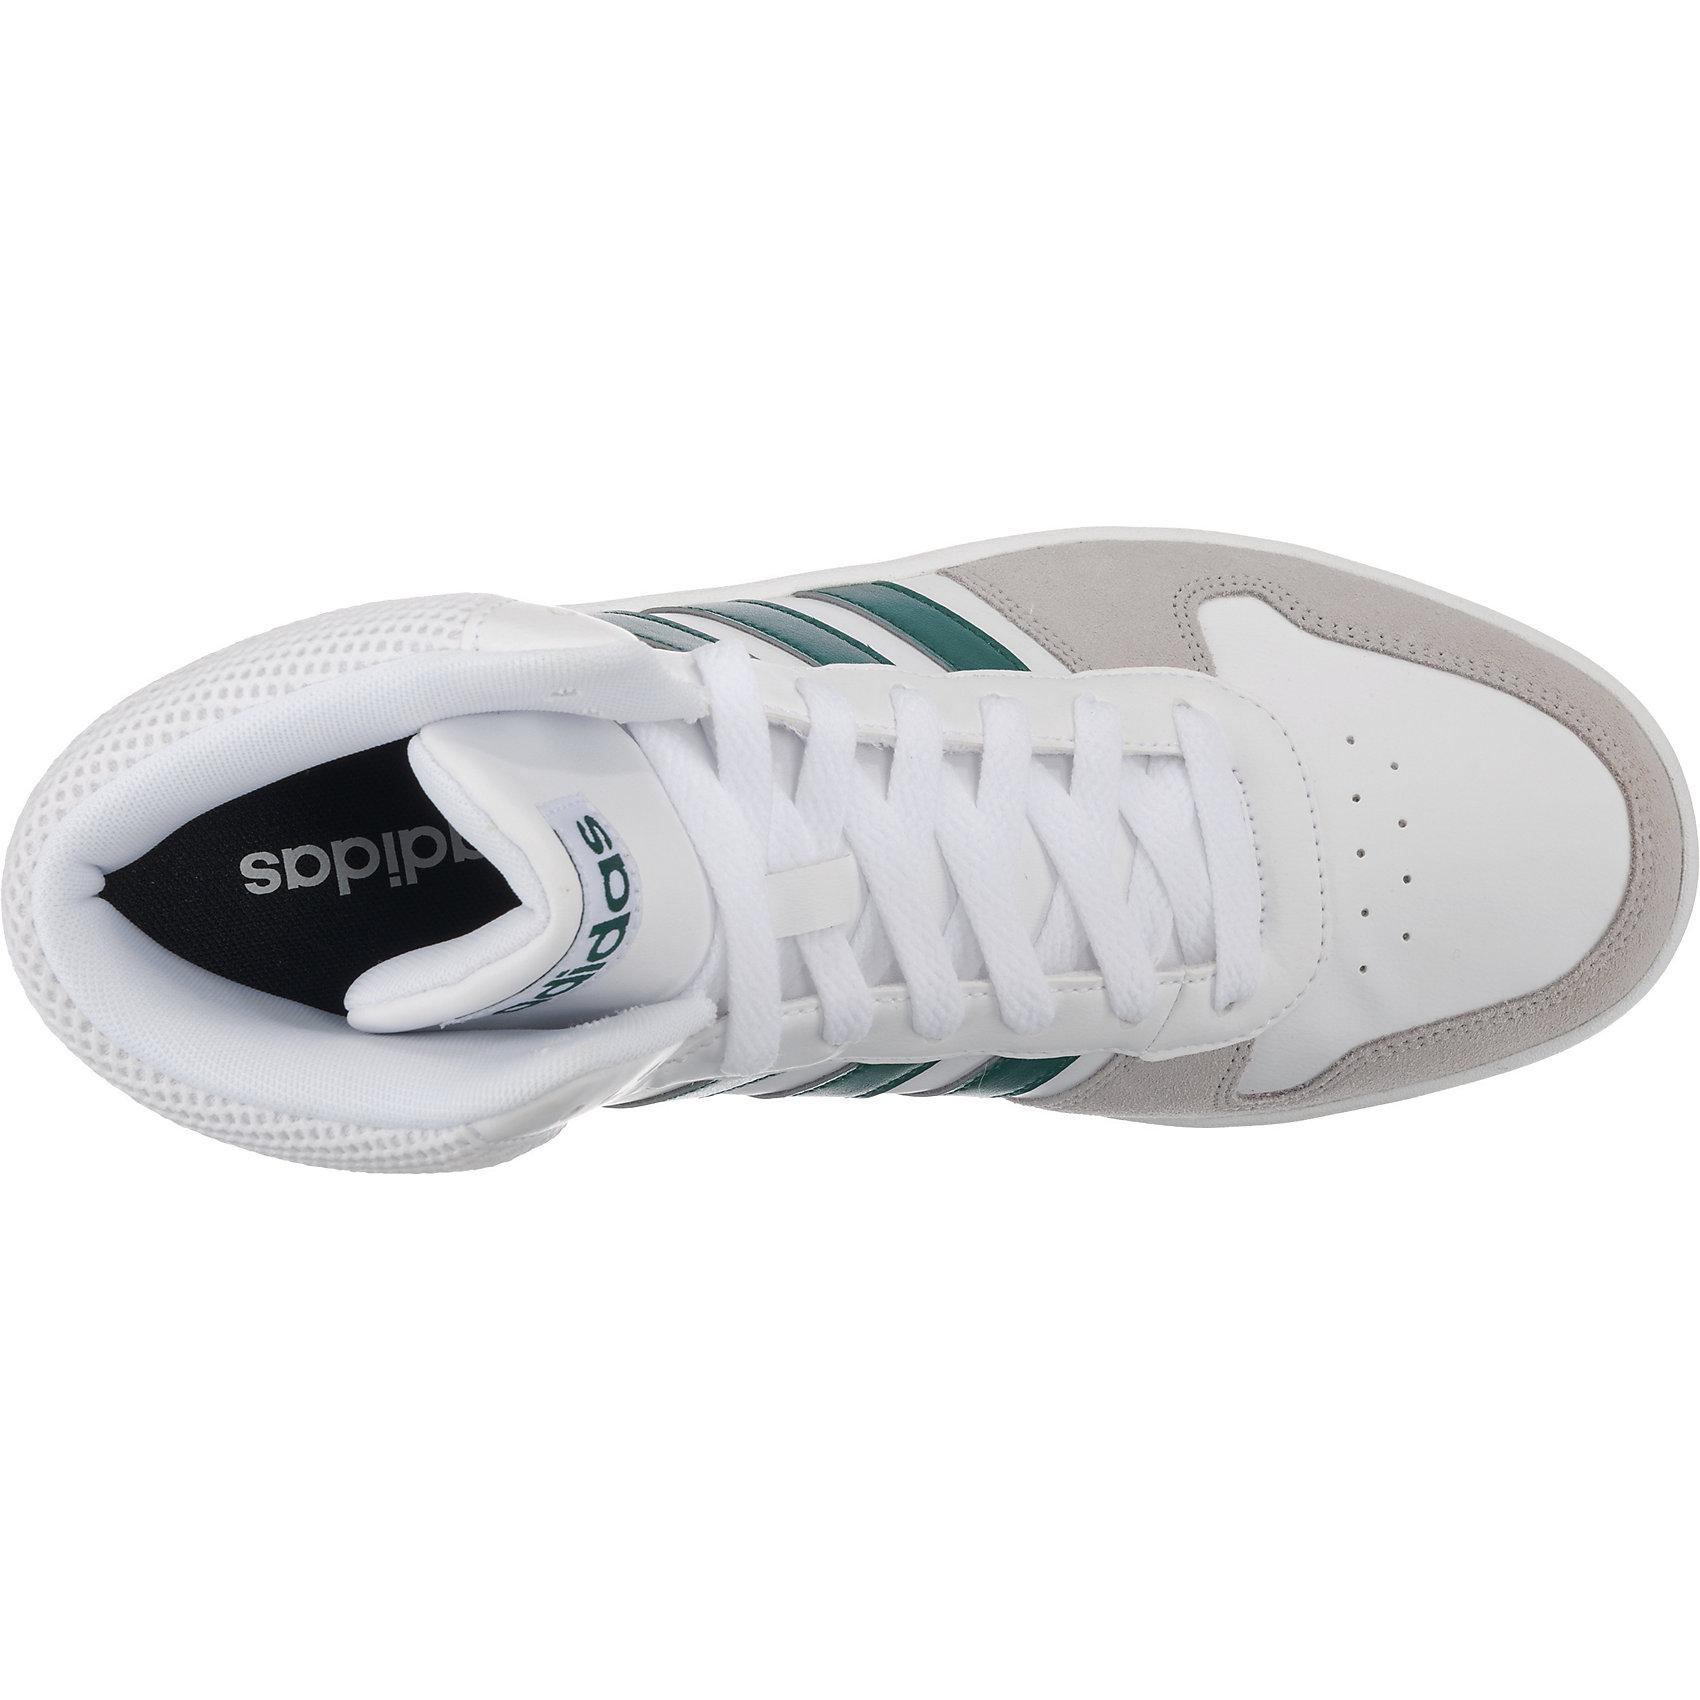 08799cbd219672 Neu adidas Sport Inspired Hoops 2.0 Mid Sneakers High 8338636 für ...